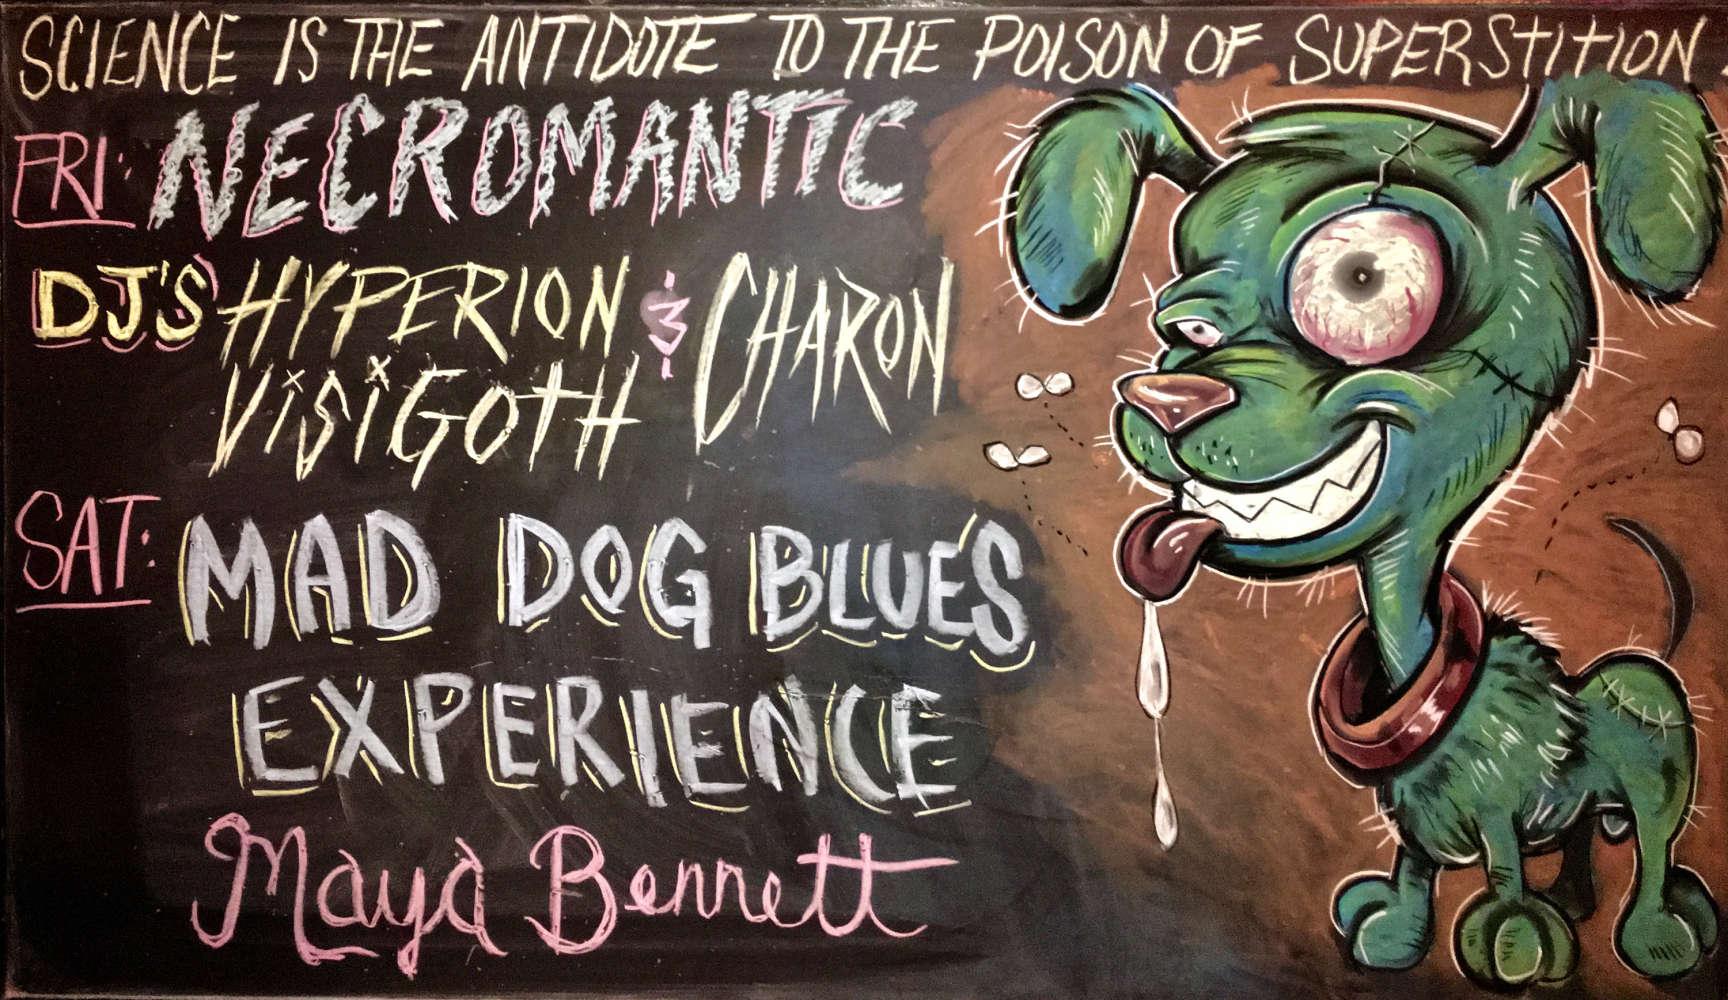 Chalkboart art by Joshua Finley. Photo courtesy Robert Mitton.